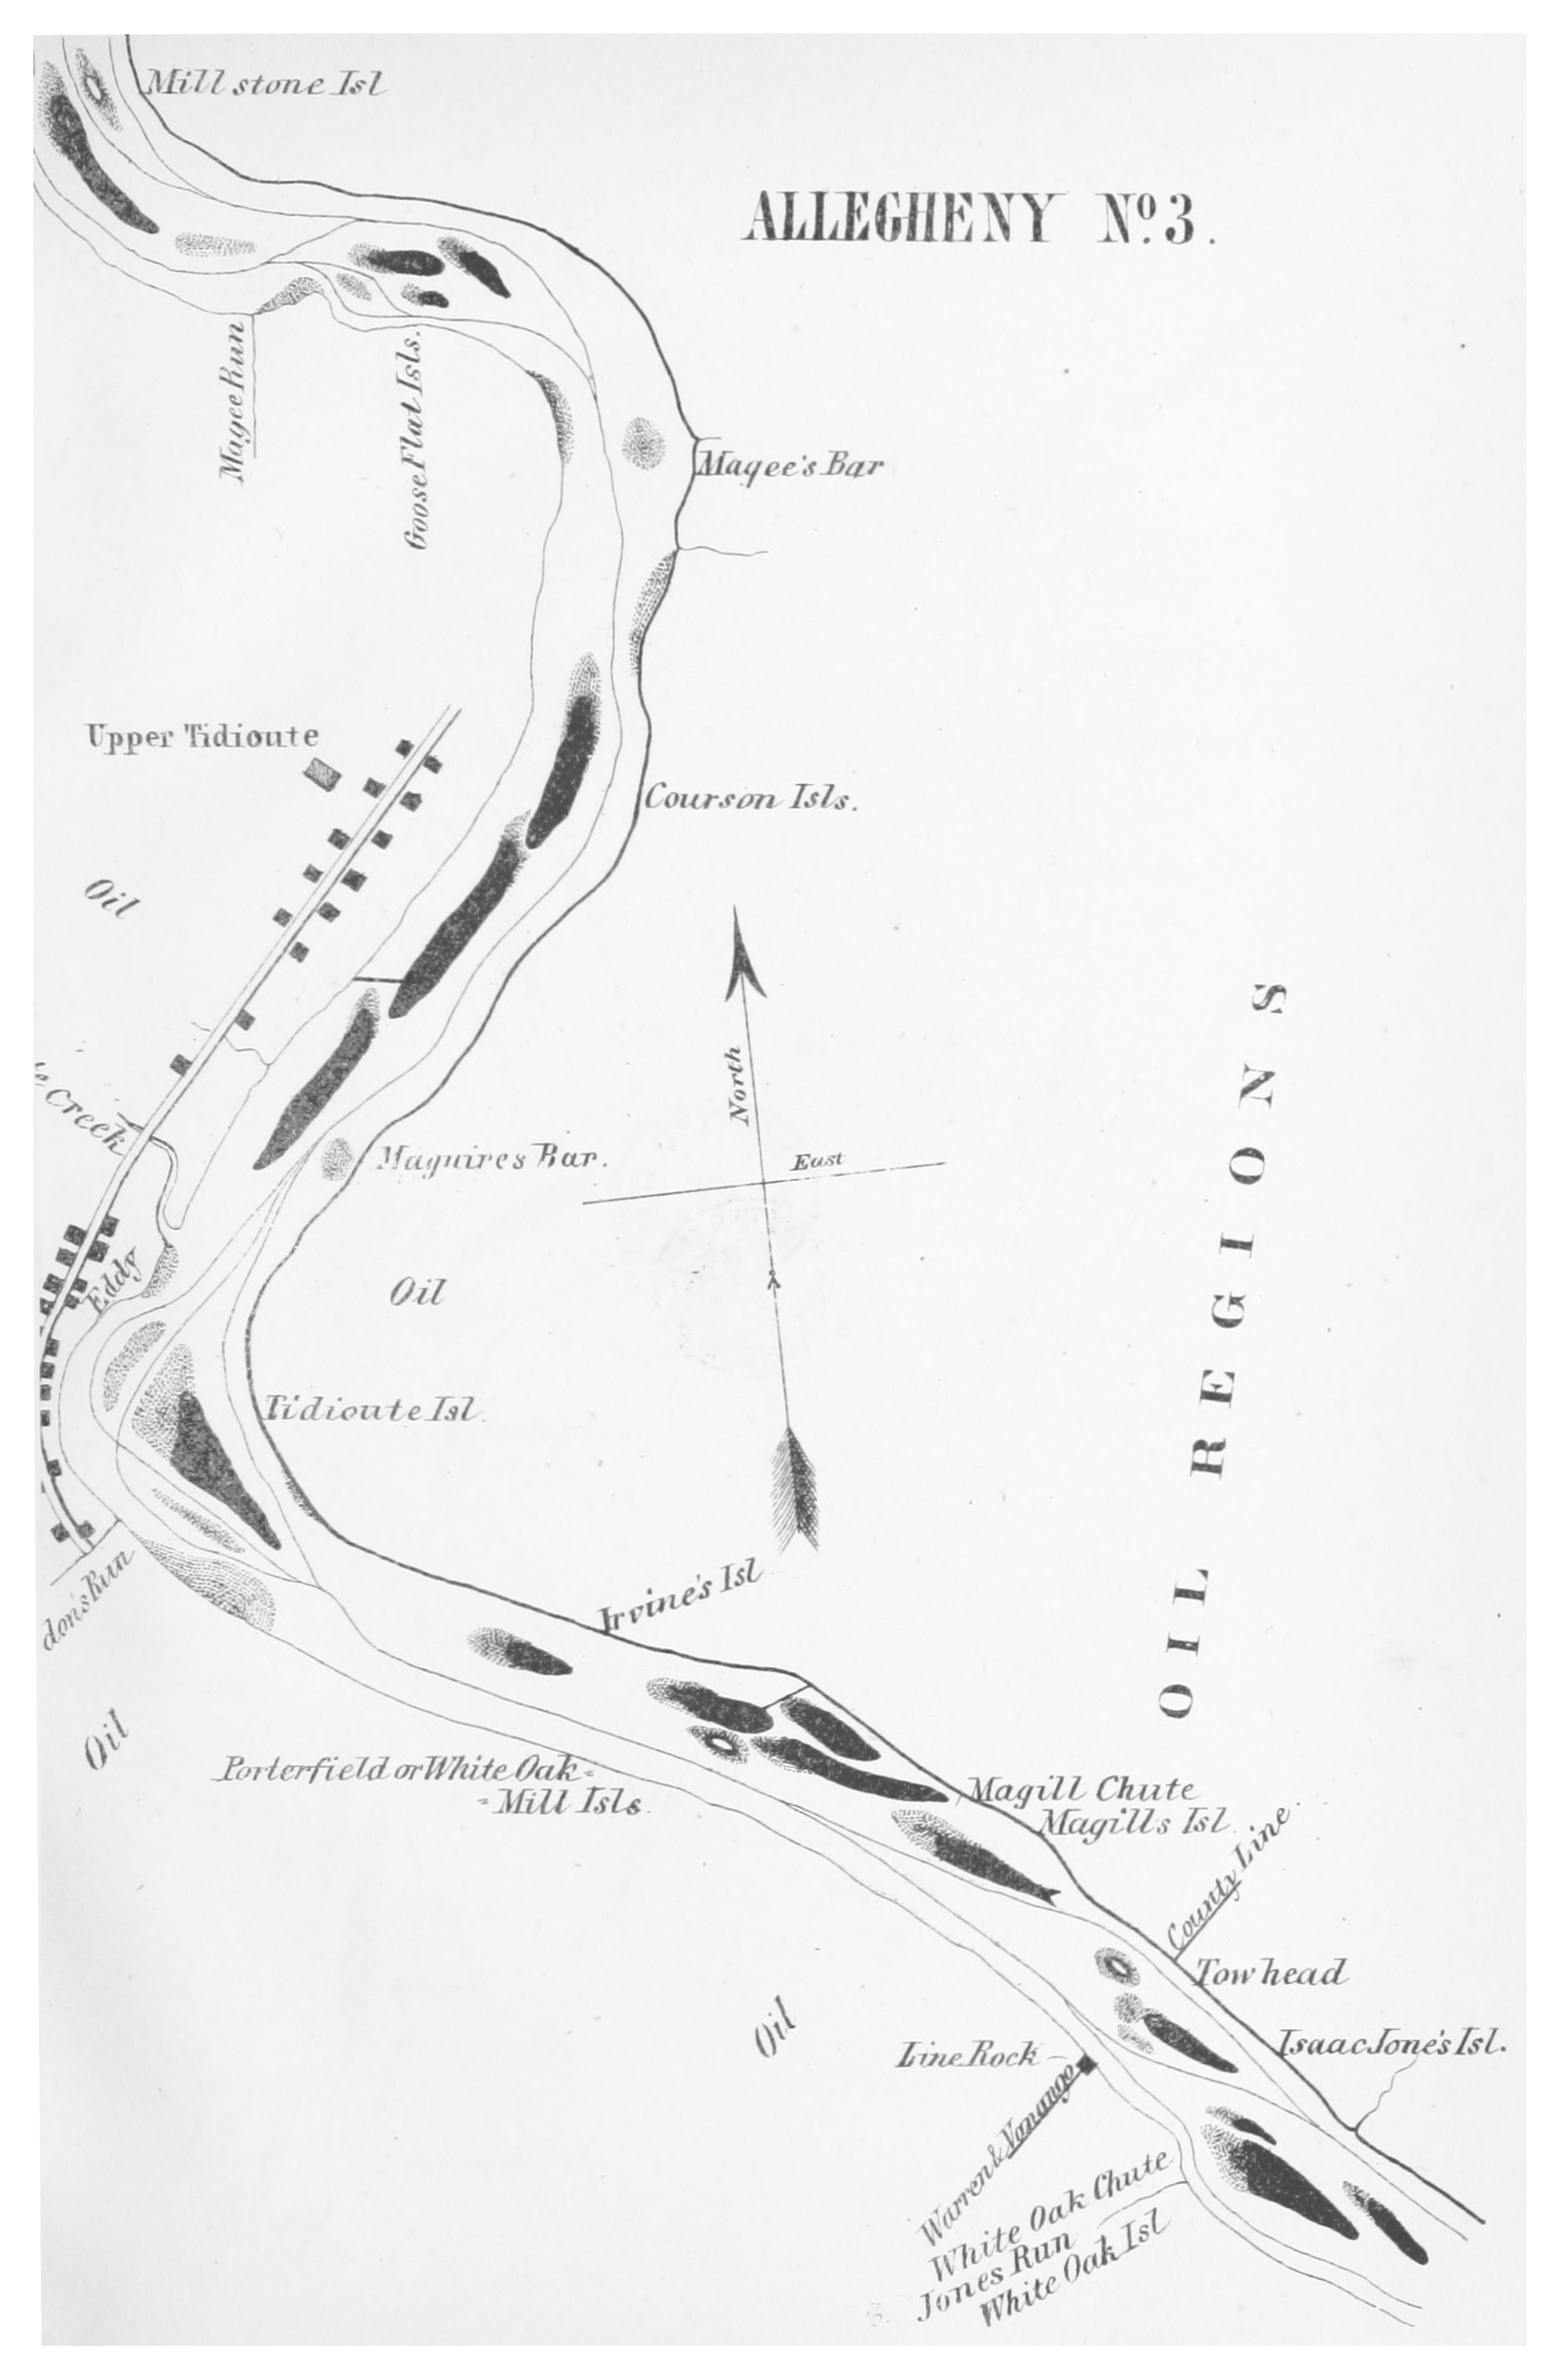 File:GILLELEN(1864) p049 Oil Creek, Allegheny River, Map 3